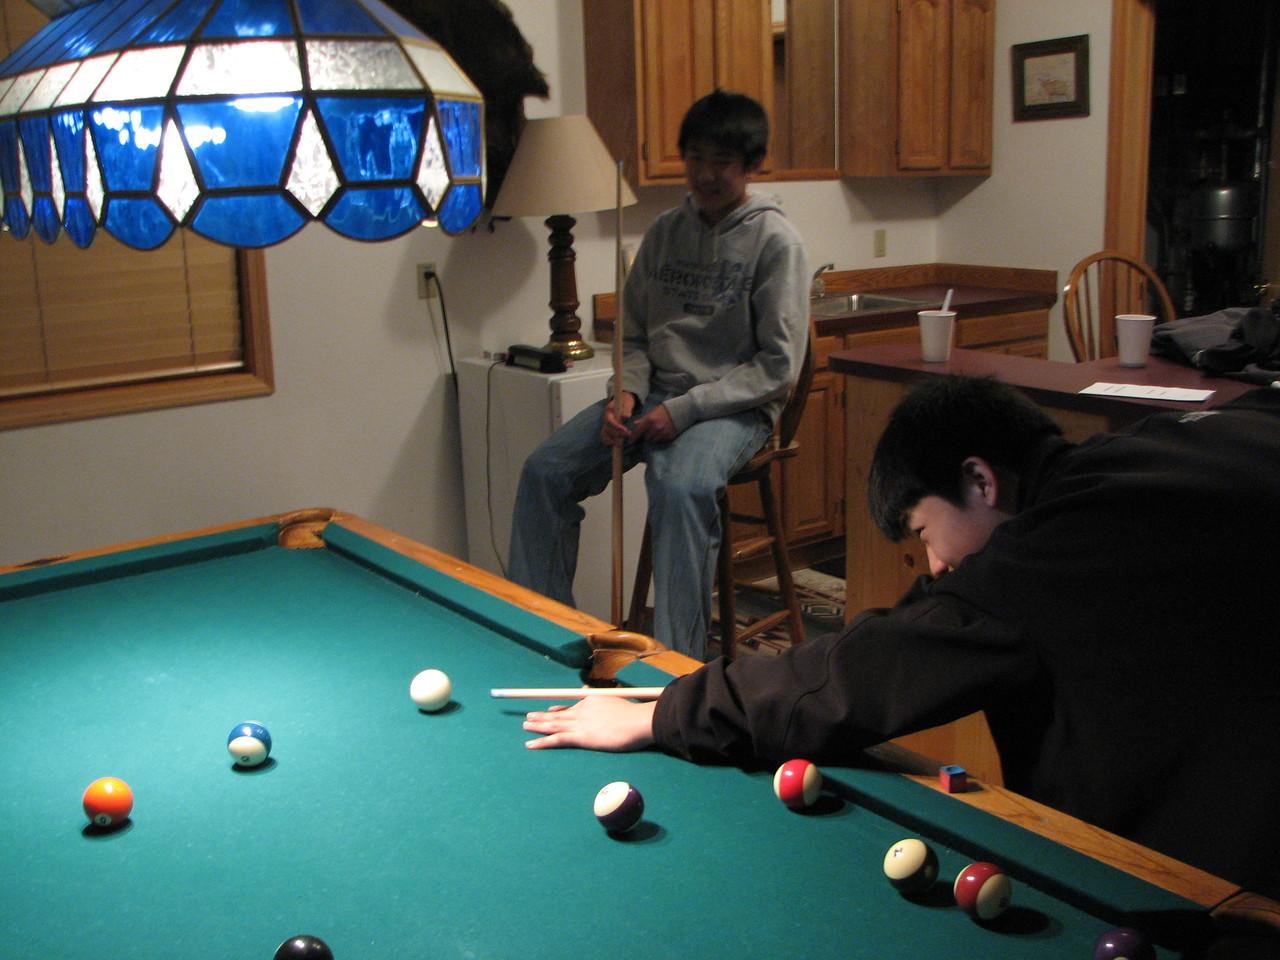 2006 12 21 Thu - Paul Kang & Jay Lee playing pool